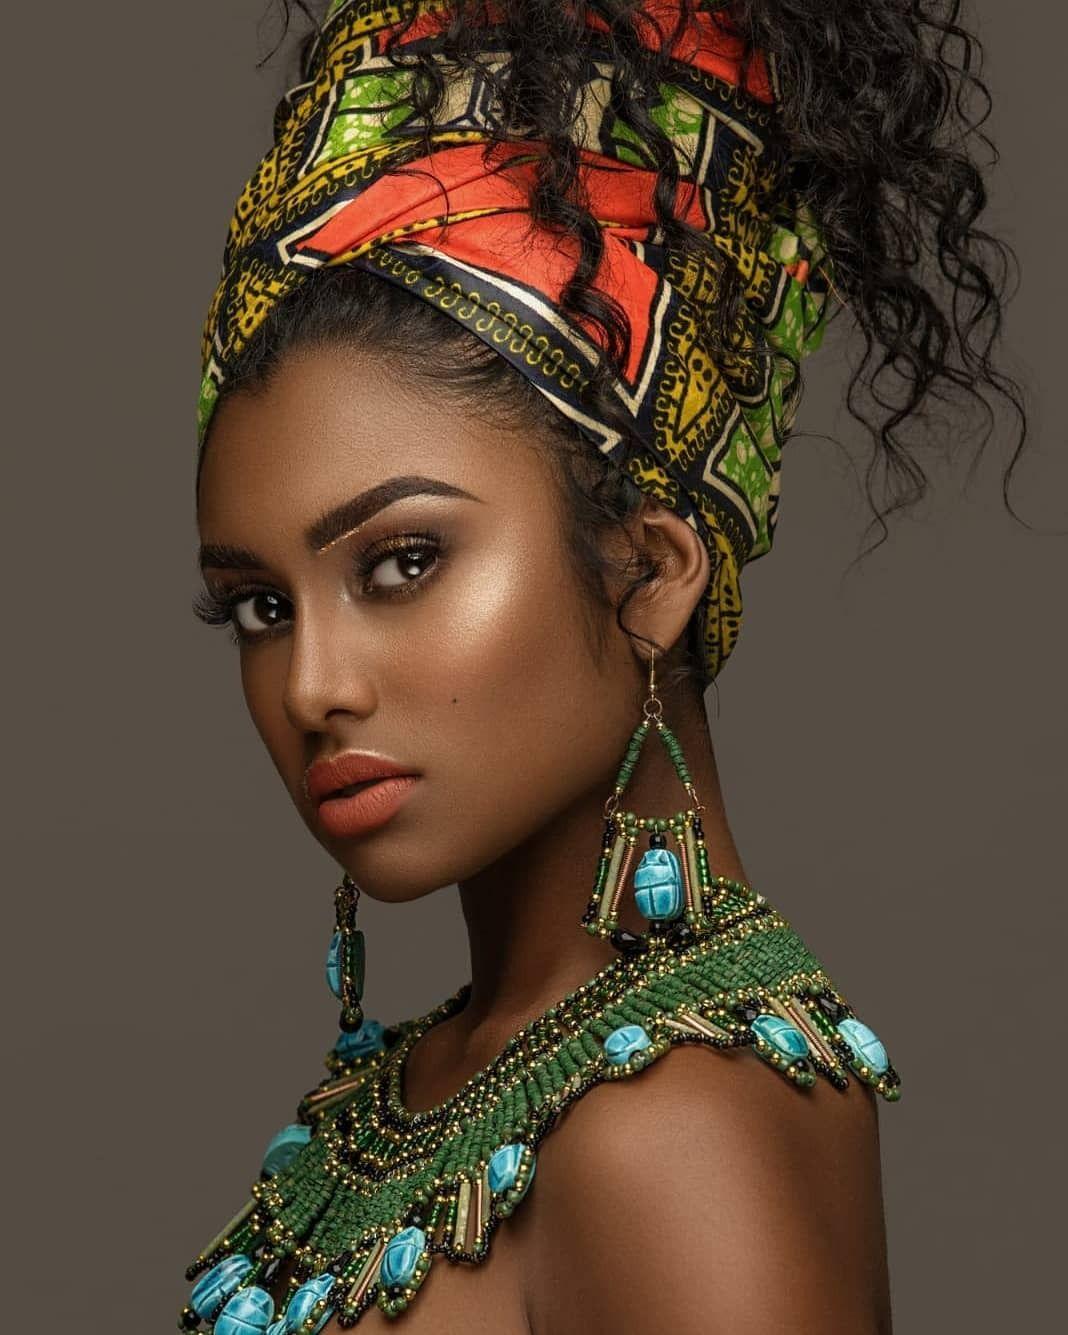 Divine beauties — Irisa // Ph: Joey Rosado